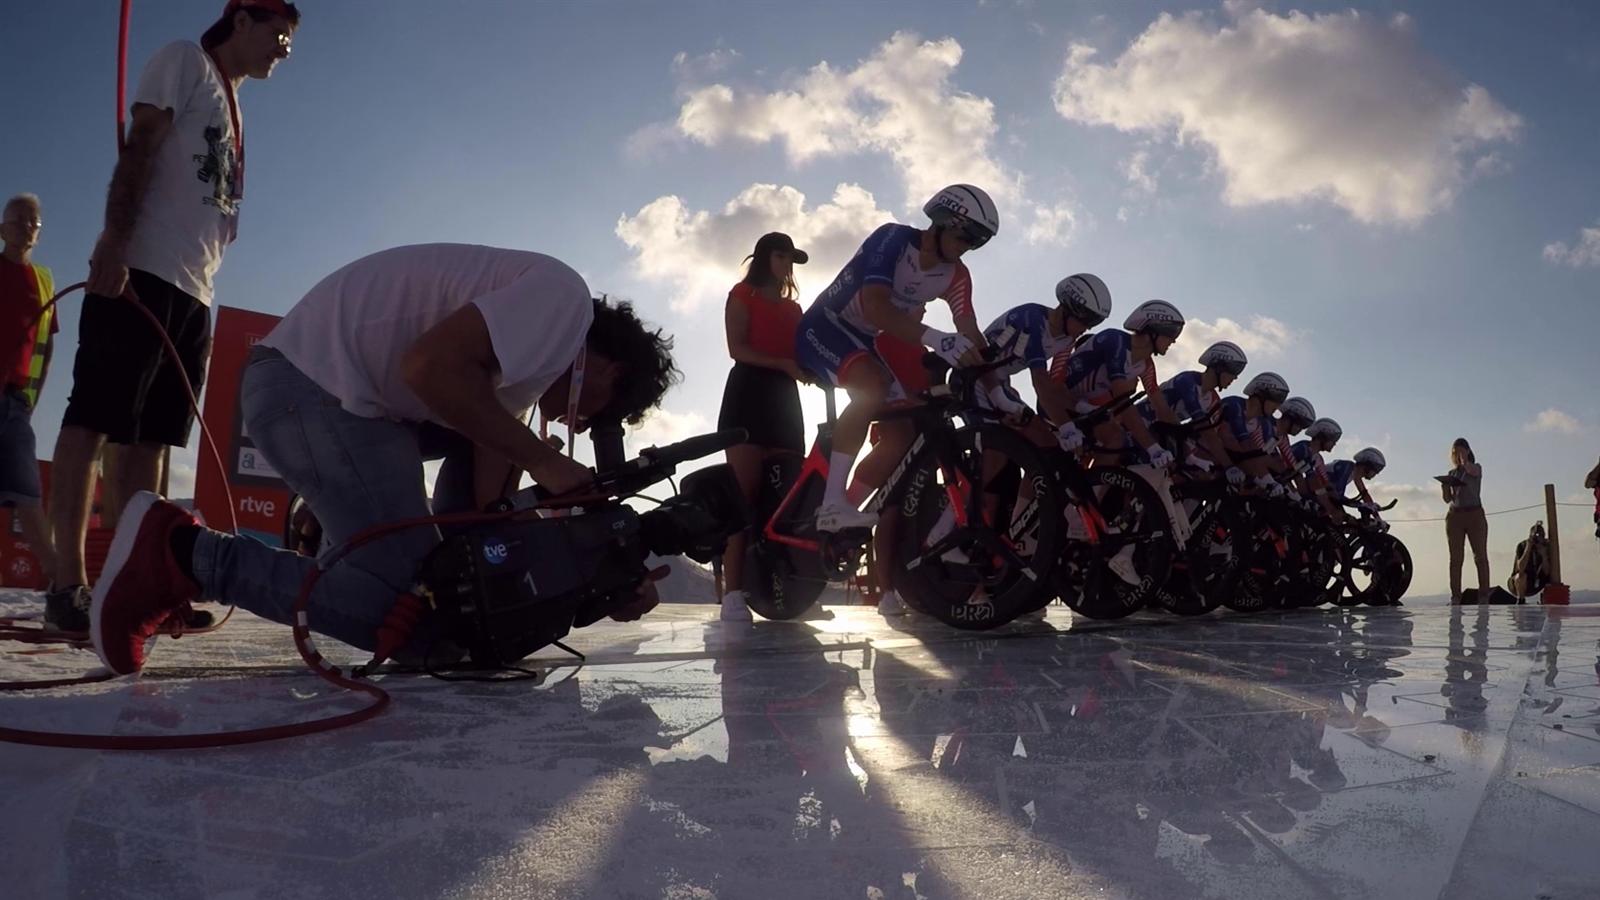 Vuelta a Espana: onboard beelden etappe 1